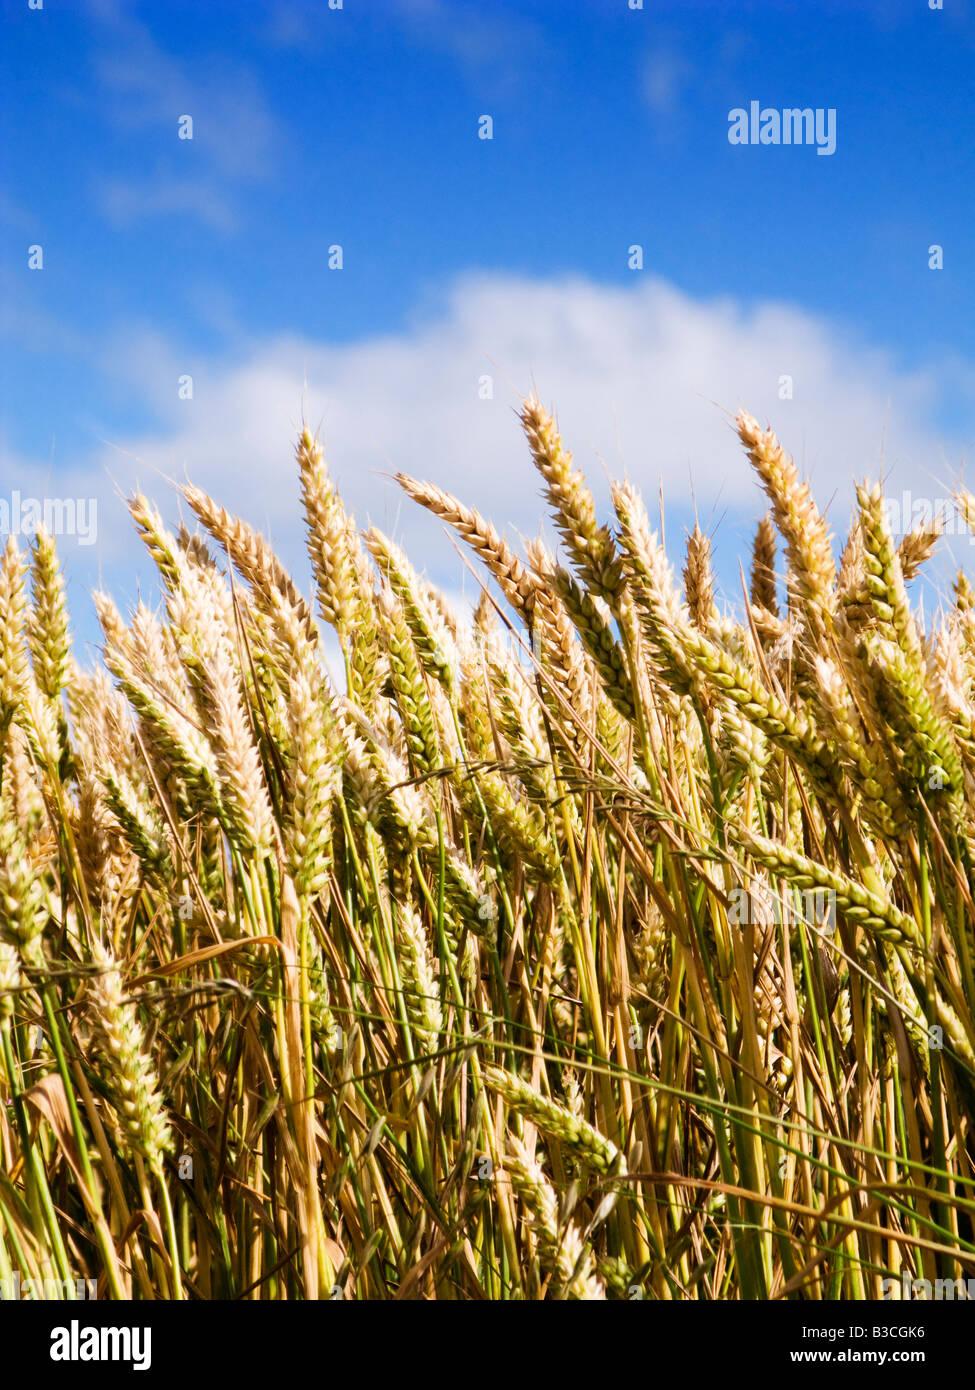 Cerca de trigo contra un cielo azul en verano Imagen De Stock